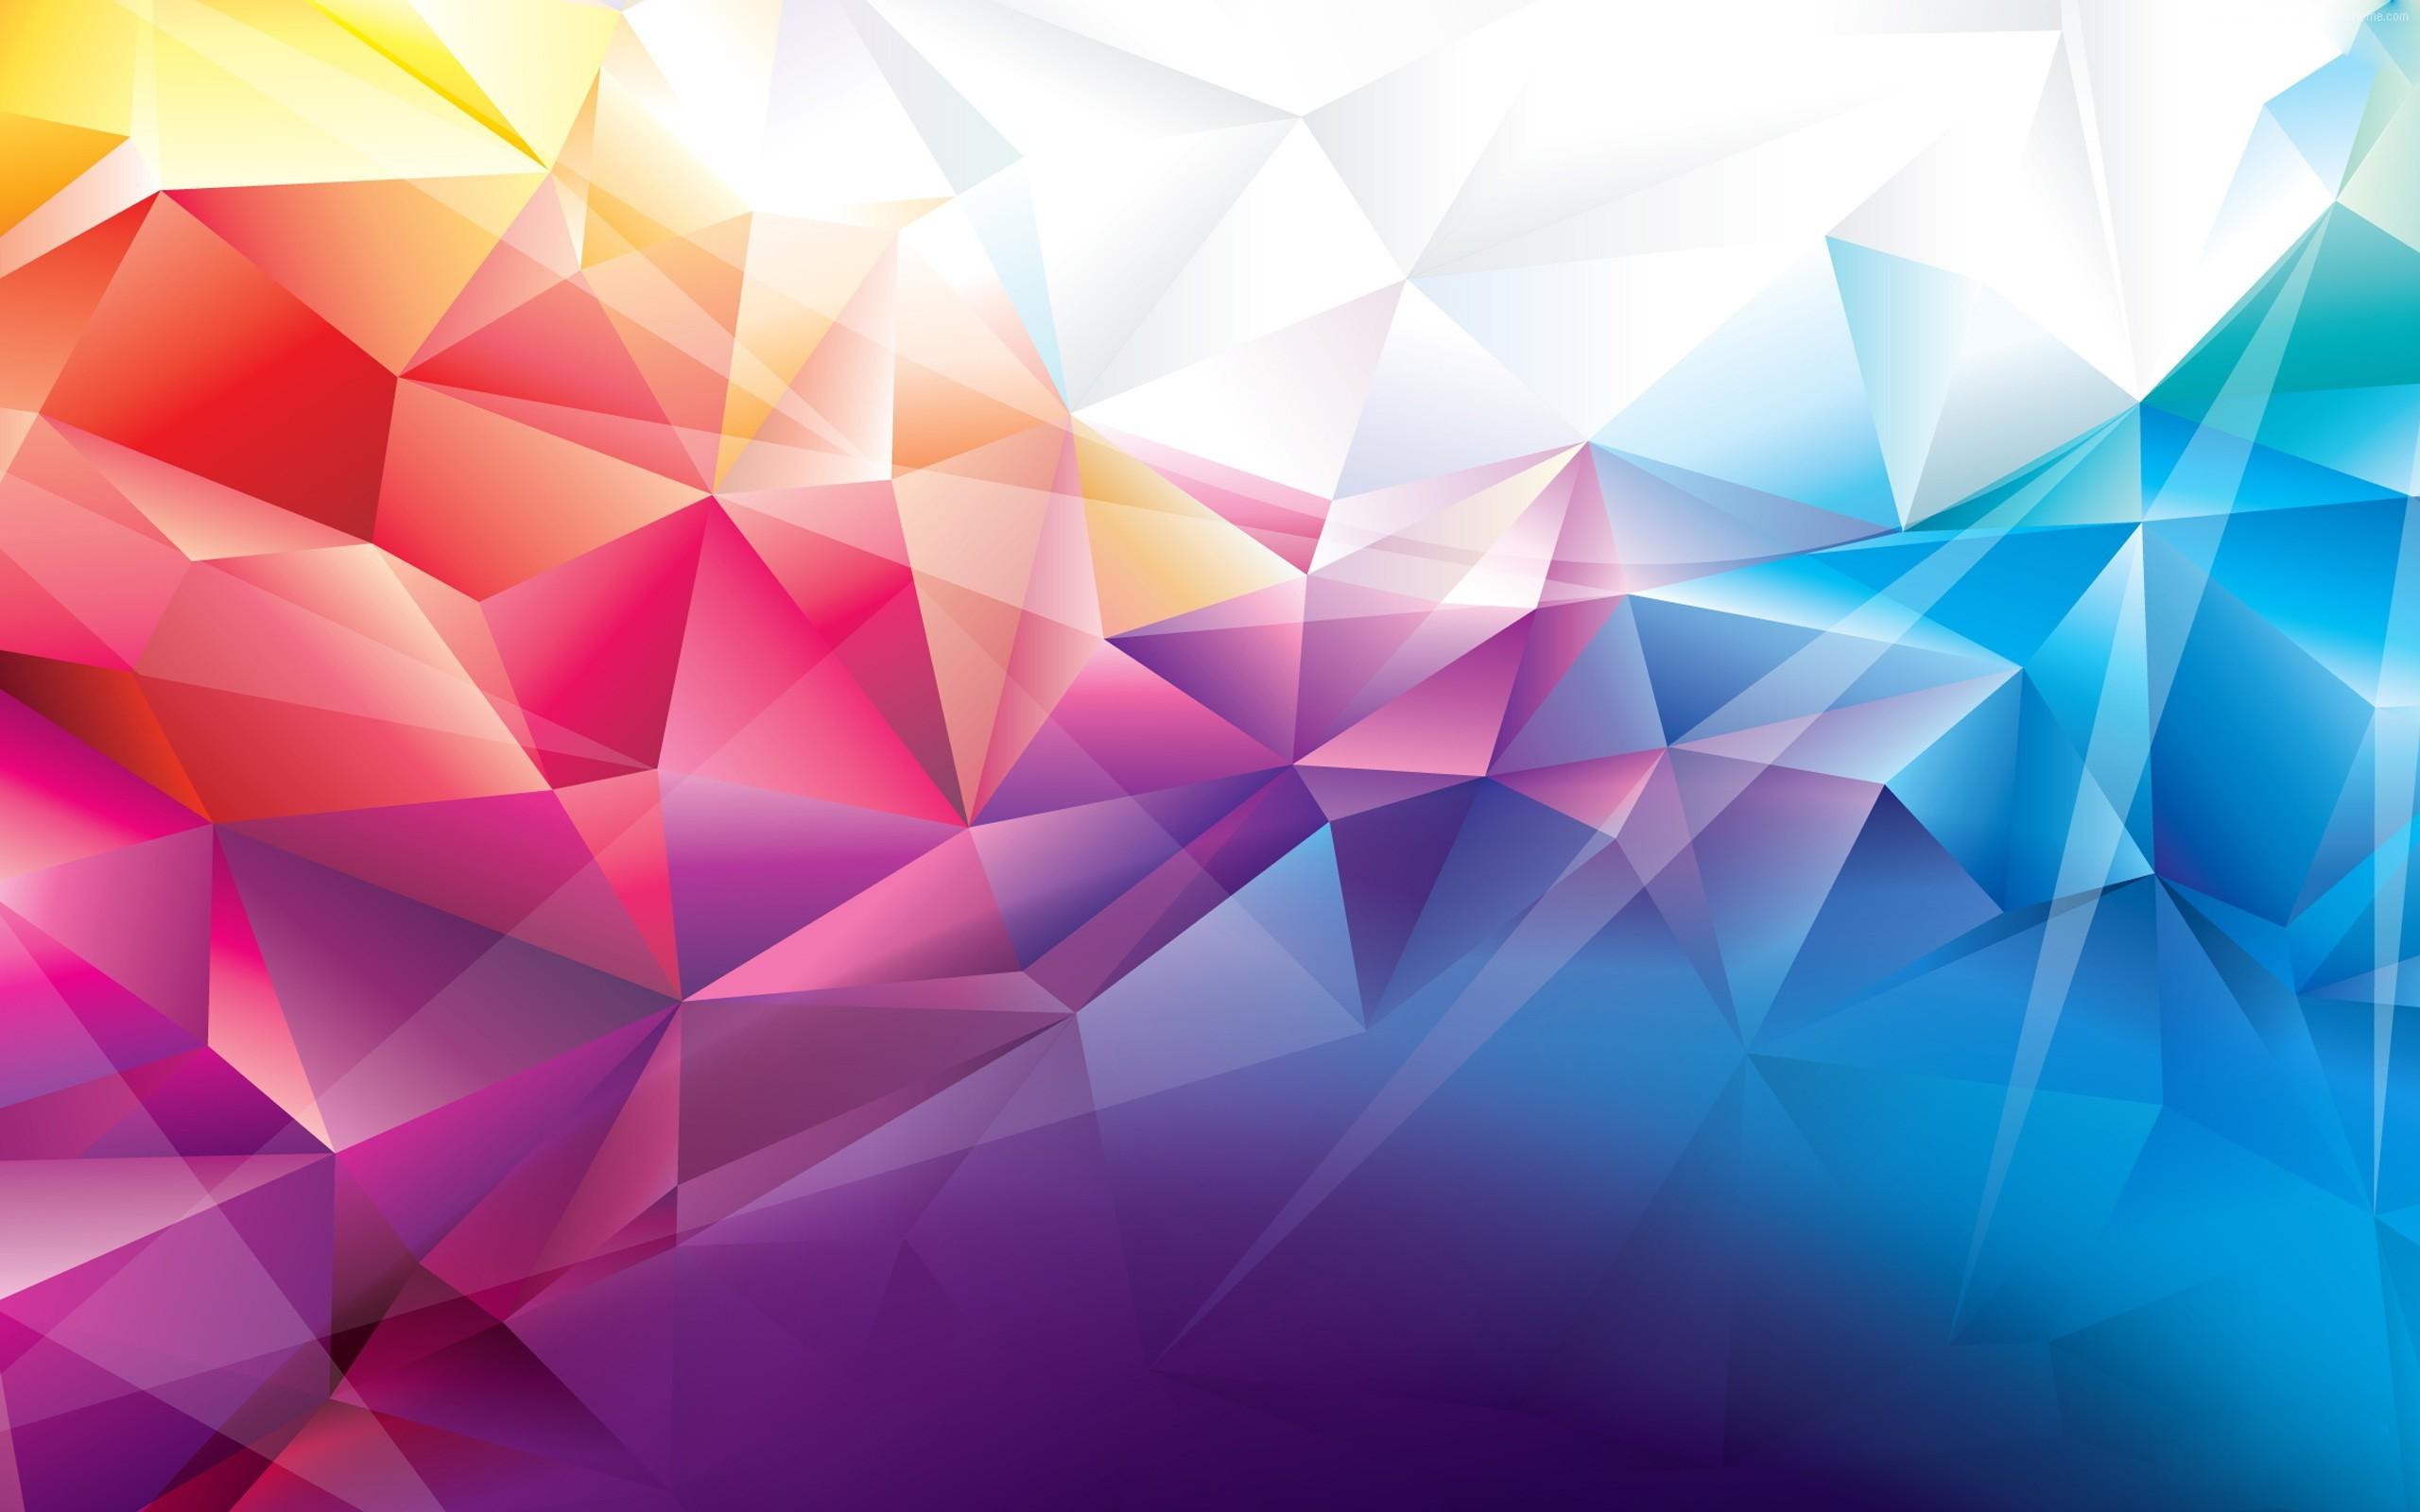 polygon-2560×1600-4k-hd-wallpaper-orange-red-blue-background-pattern-225.jpg